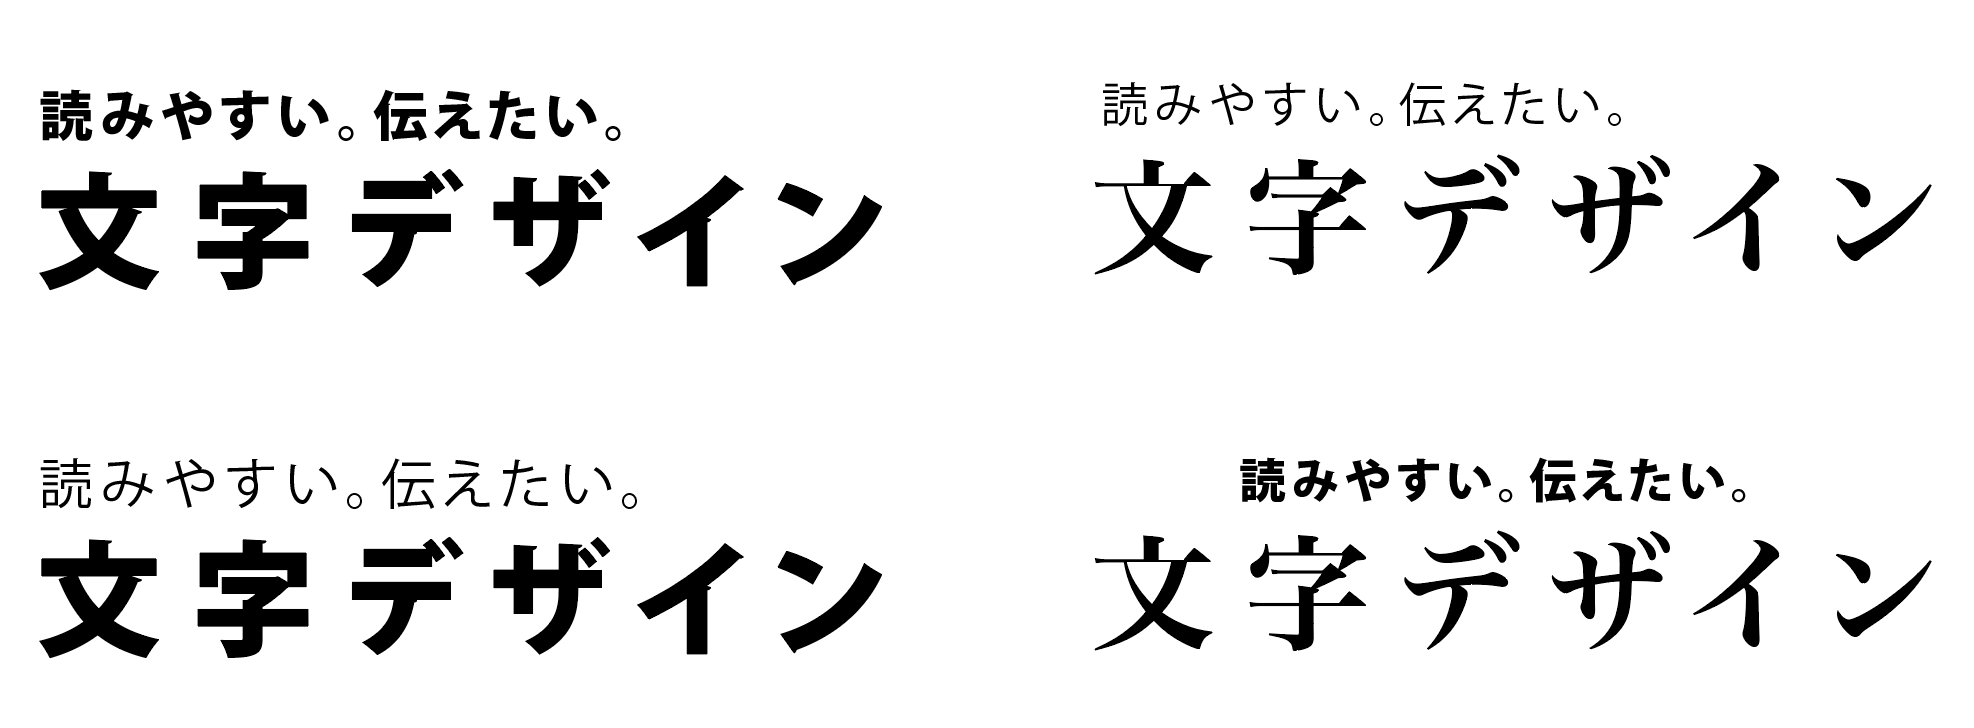 Illustrator_typesetting02a